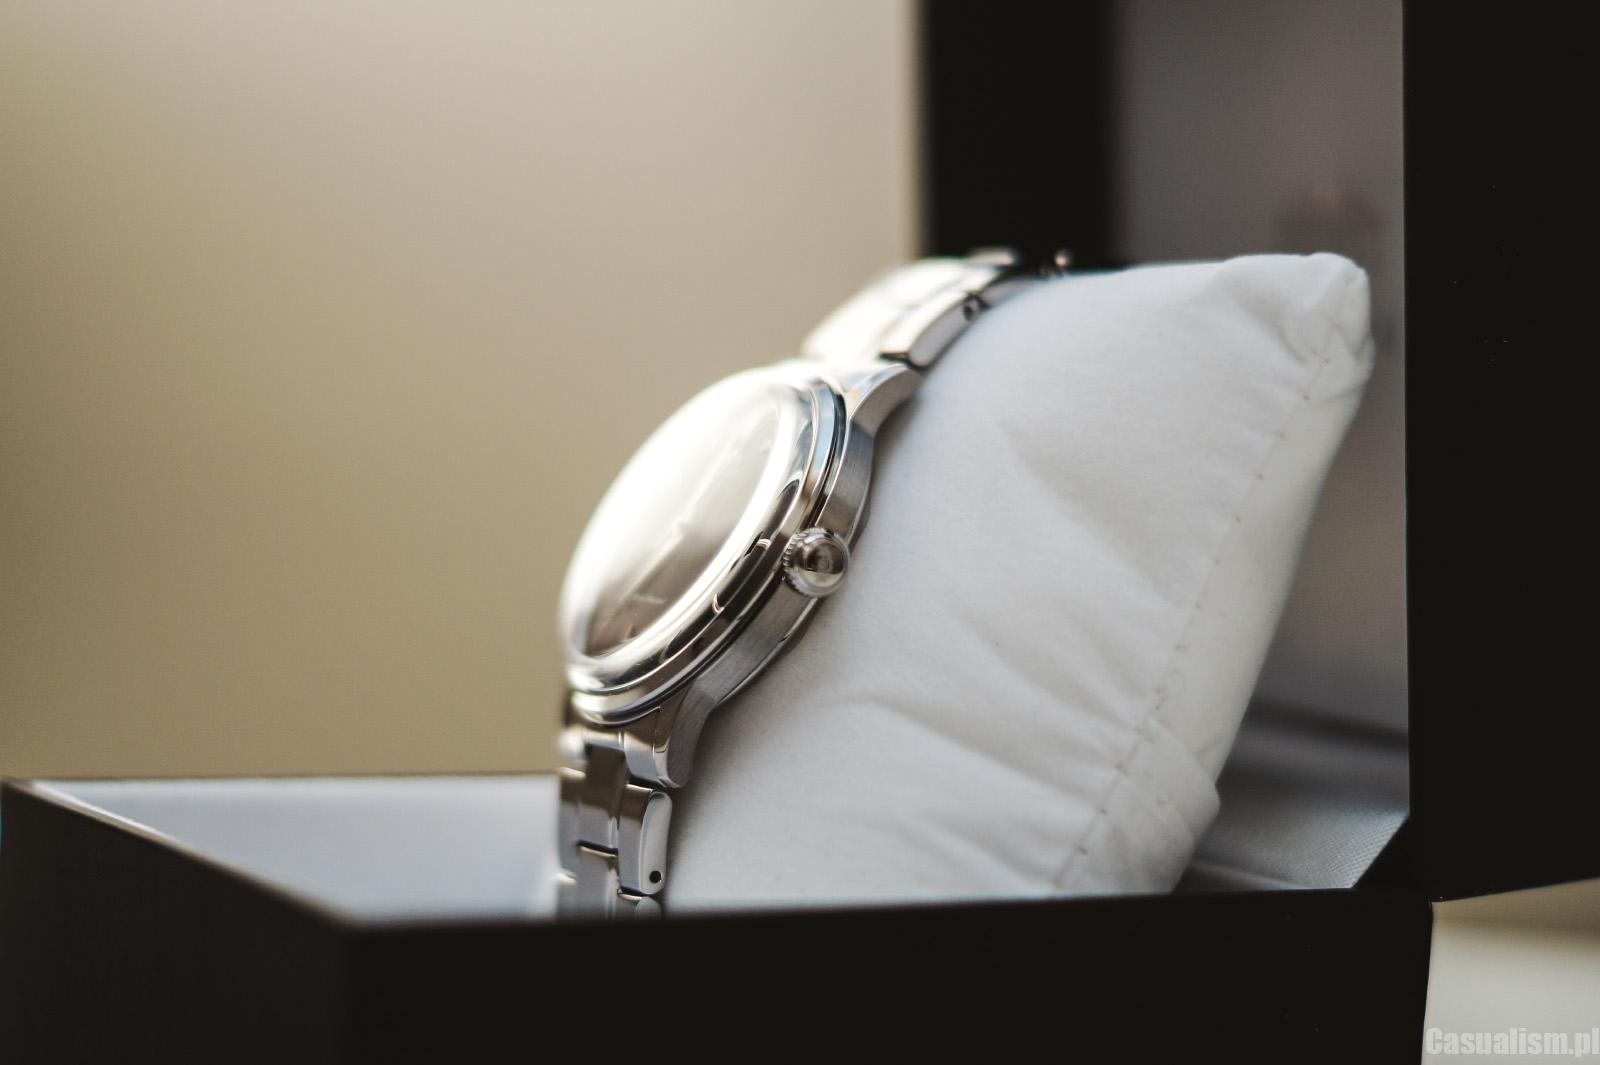 zegarki orient, orient zegarek, zegarek orient męski, męskie zegarki orient, zegarki orient opinie, jakość zegarki orient, jaka jakość orient, orient zegarkiclub, orient zegarek dla faceta